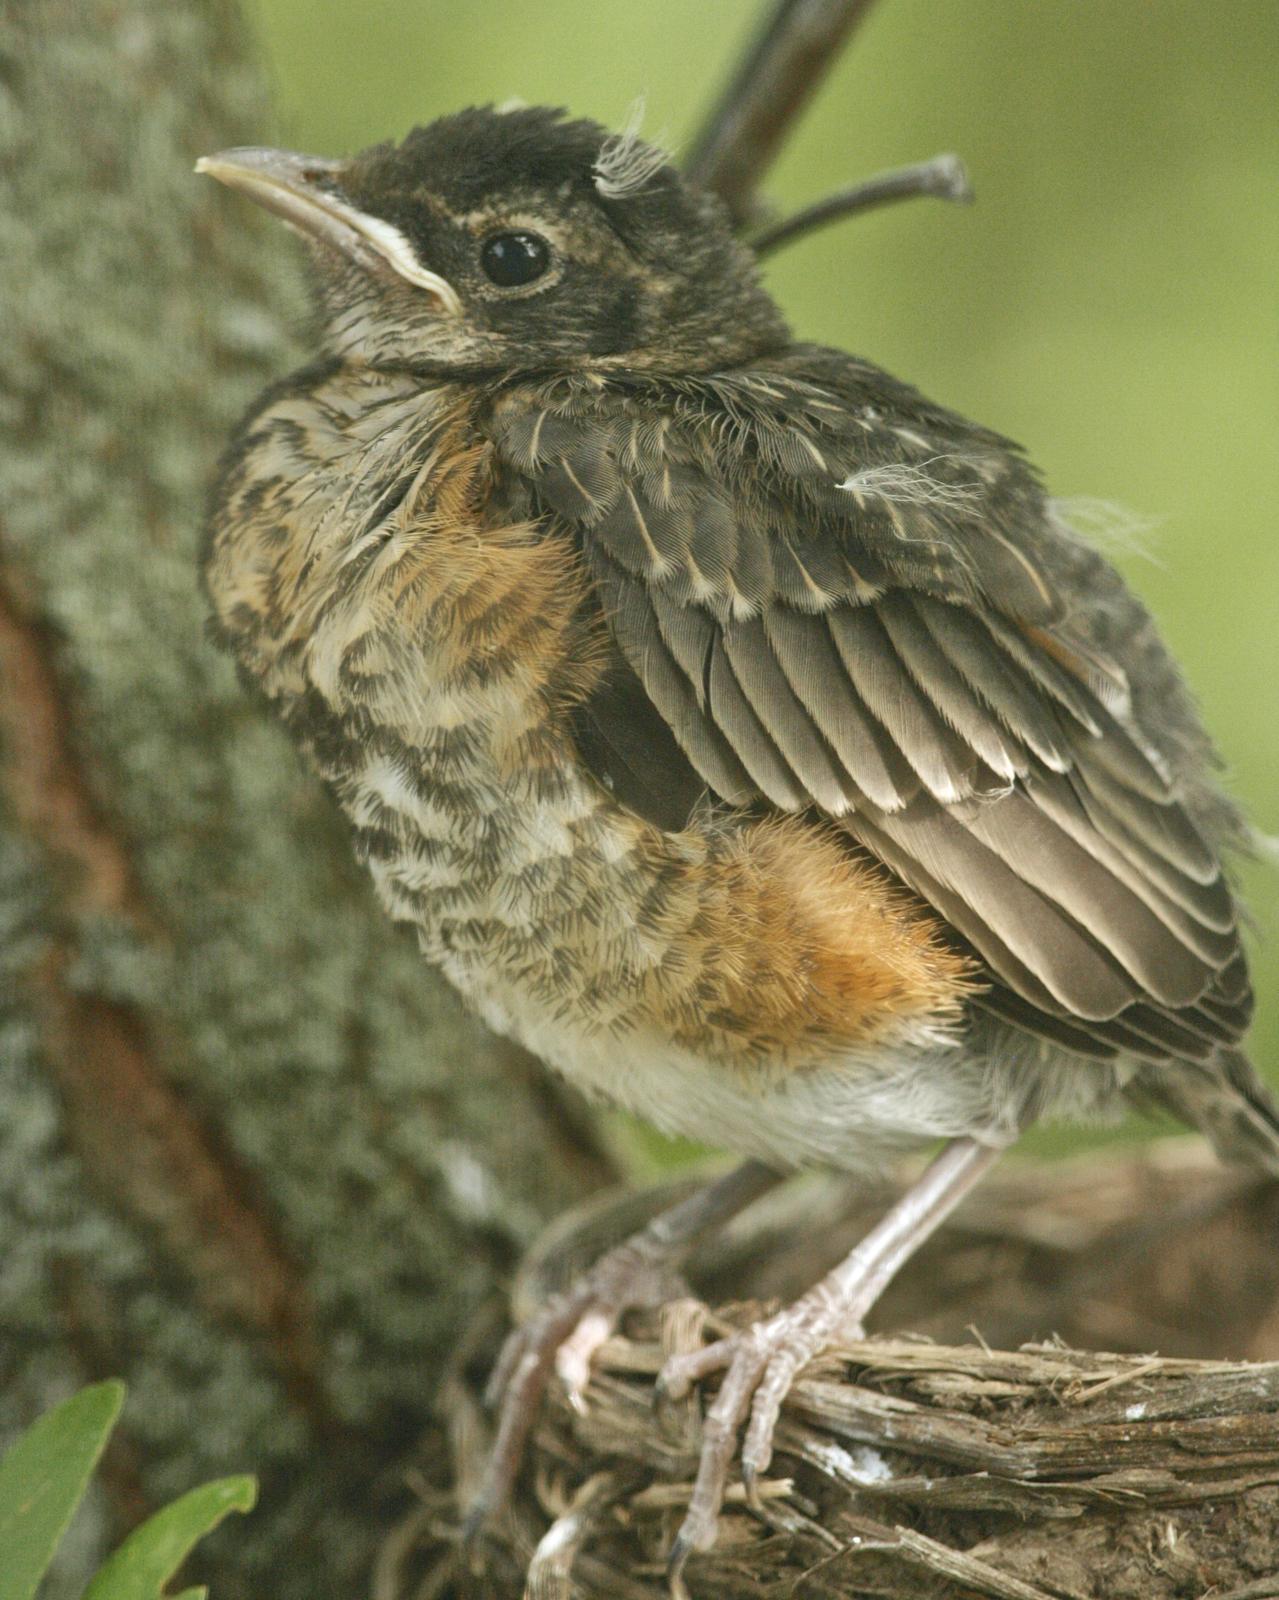 American Robin Photo by Oscar Johnson